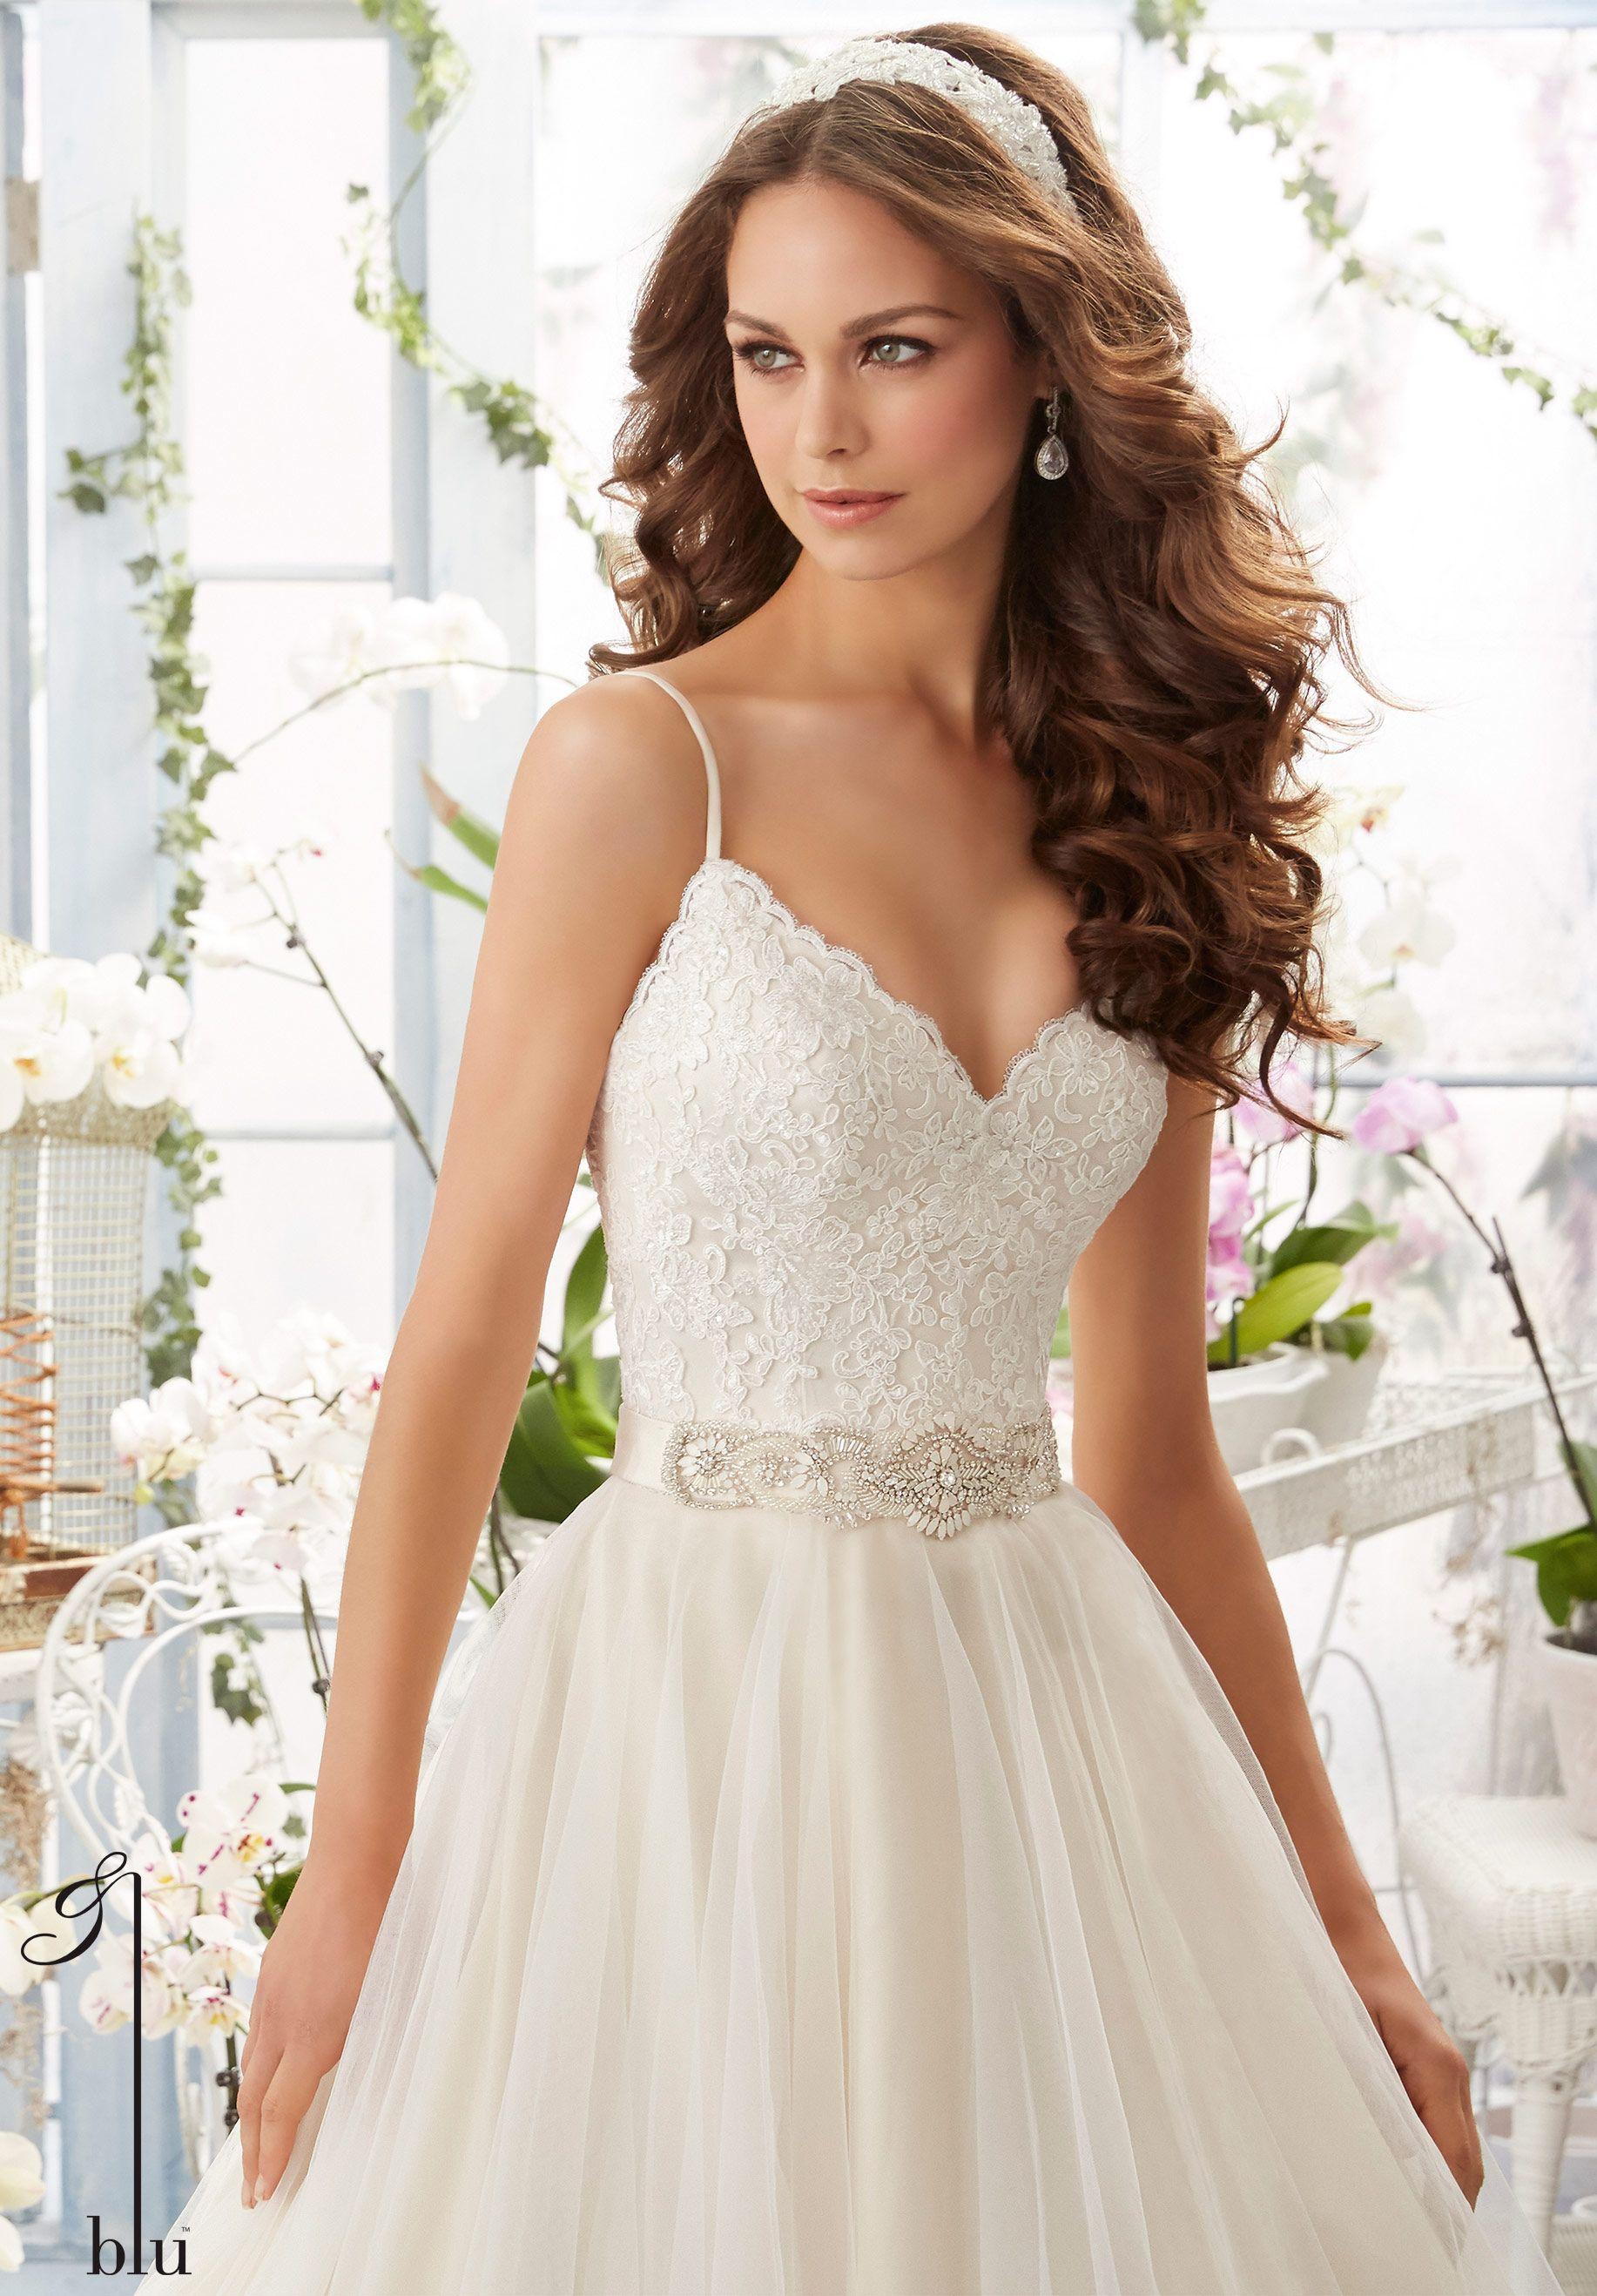 Wedding Gown 5416 Alencon Lace Bodice With Satin Shoulder Straps